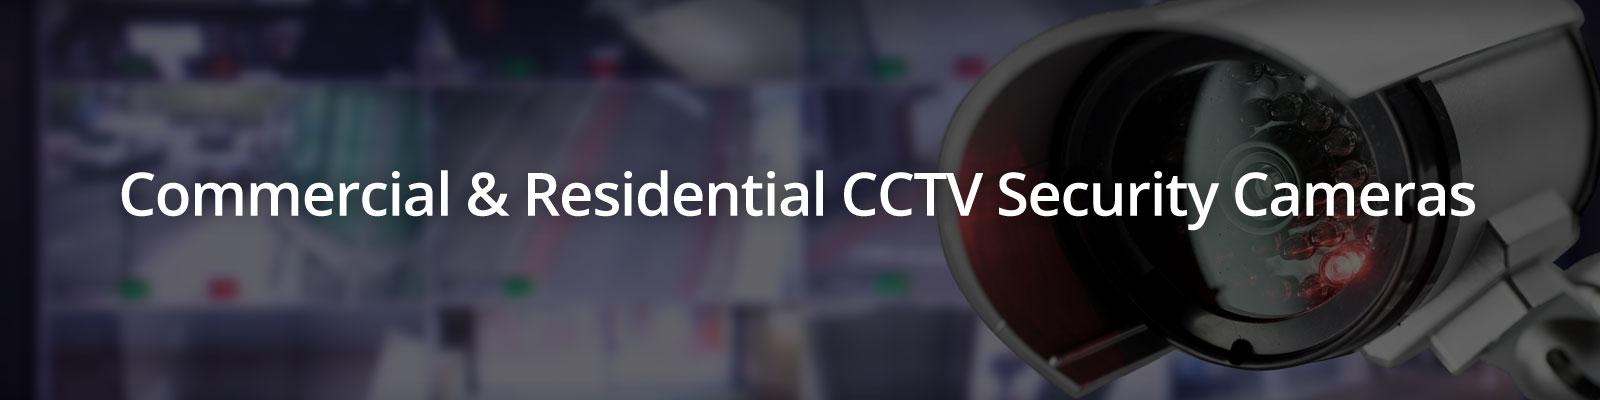 CCTV Nashville, CCTV Franklin TN, Security Cameras | CSS Alarms